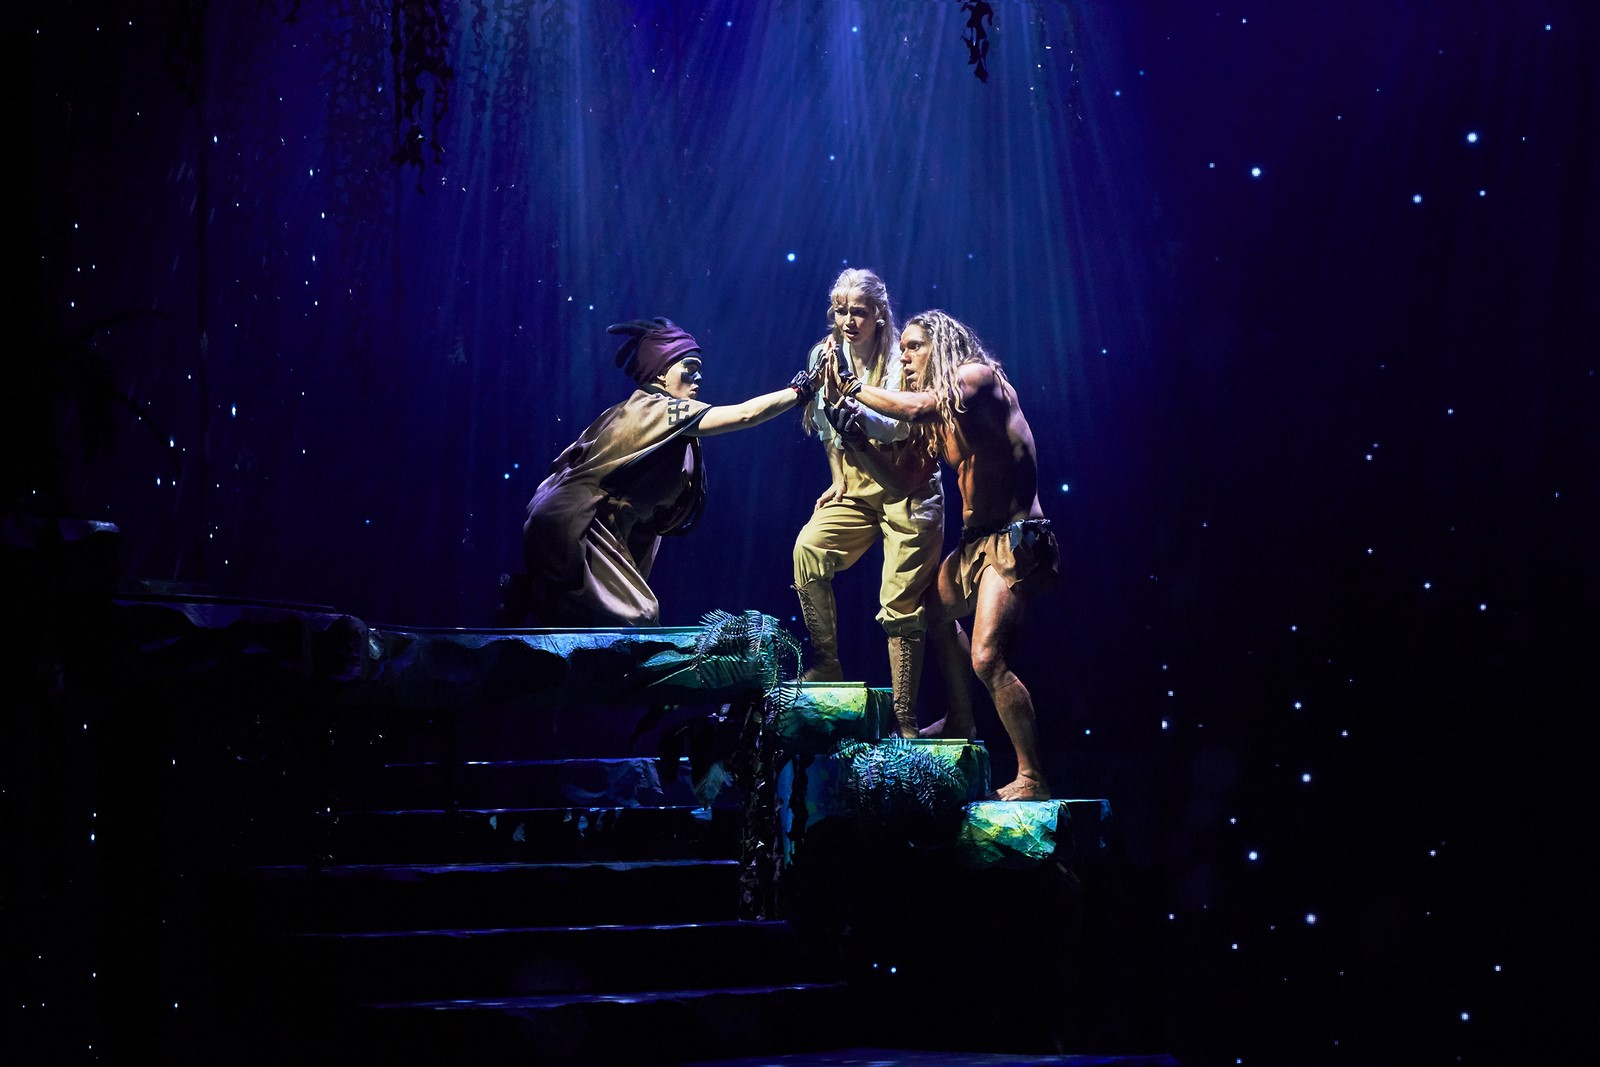 Anmeldelse: Tarzan, Fredericia Teater